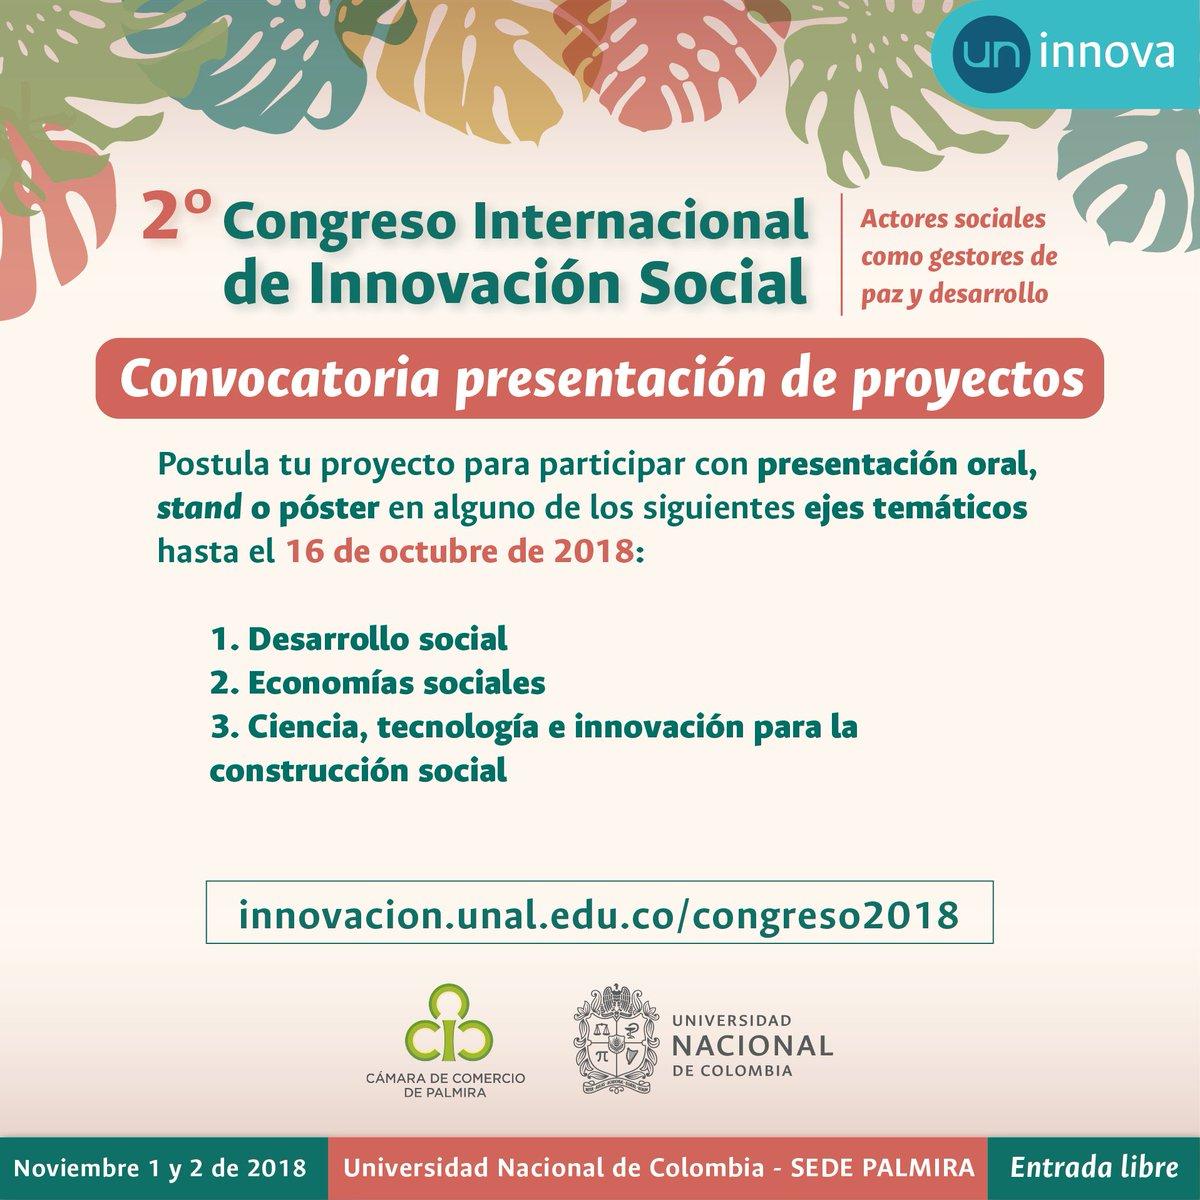 UN Innova - Universidad Nacional de Colombia (@UN_innova) | Twitter